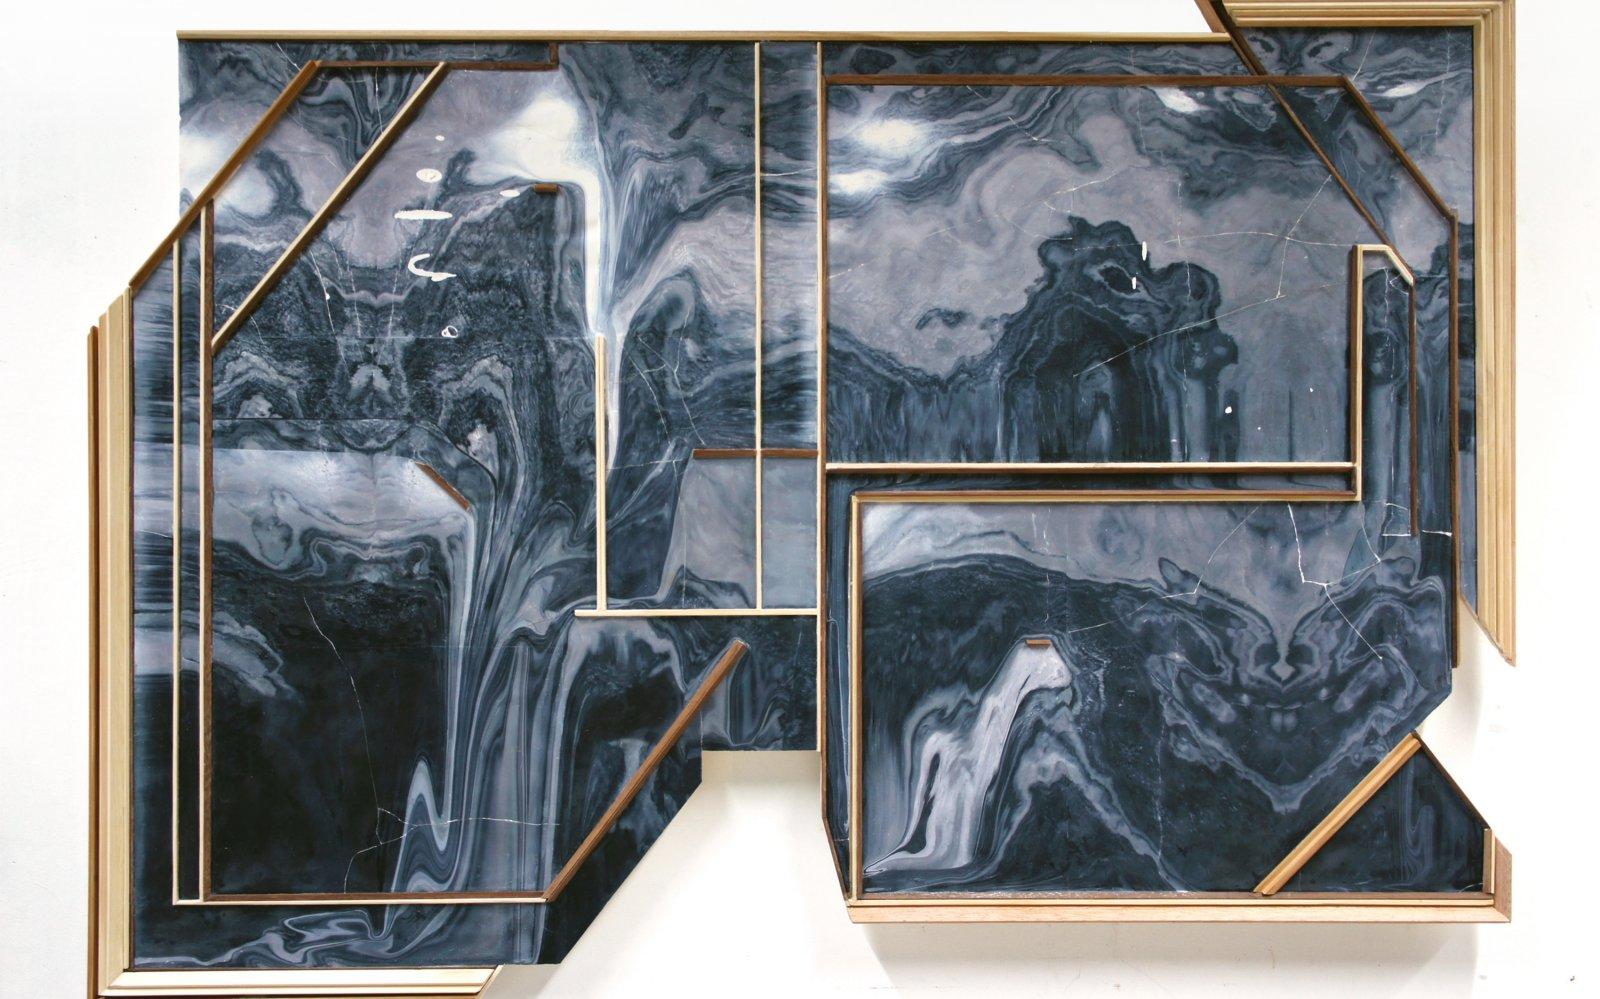 Super Surface by Lilian Kreutzberger © Lilian Kreutzberger, courtesy of CINNAMON